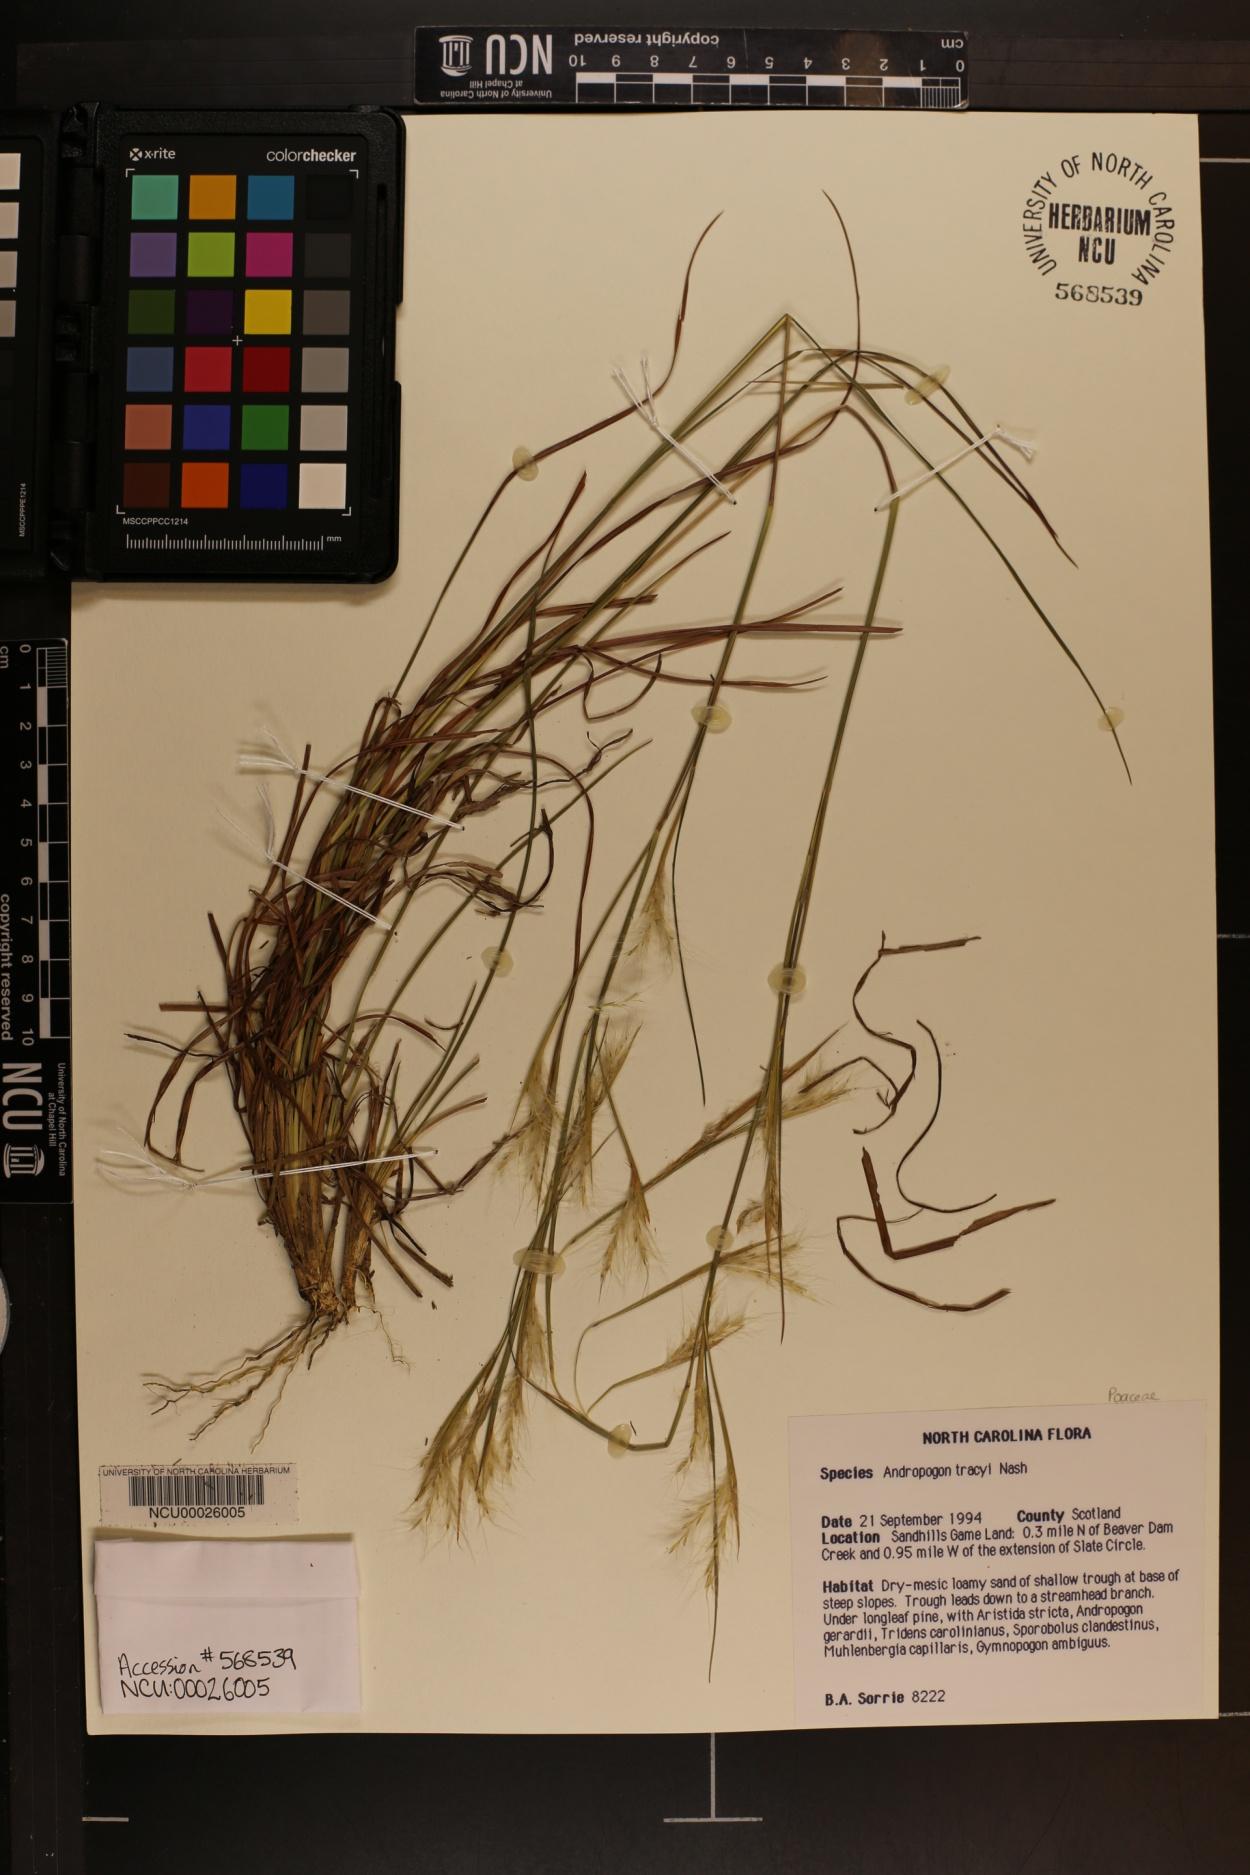 Andropogon tracyi image